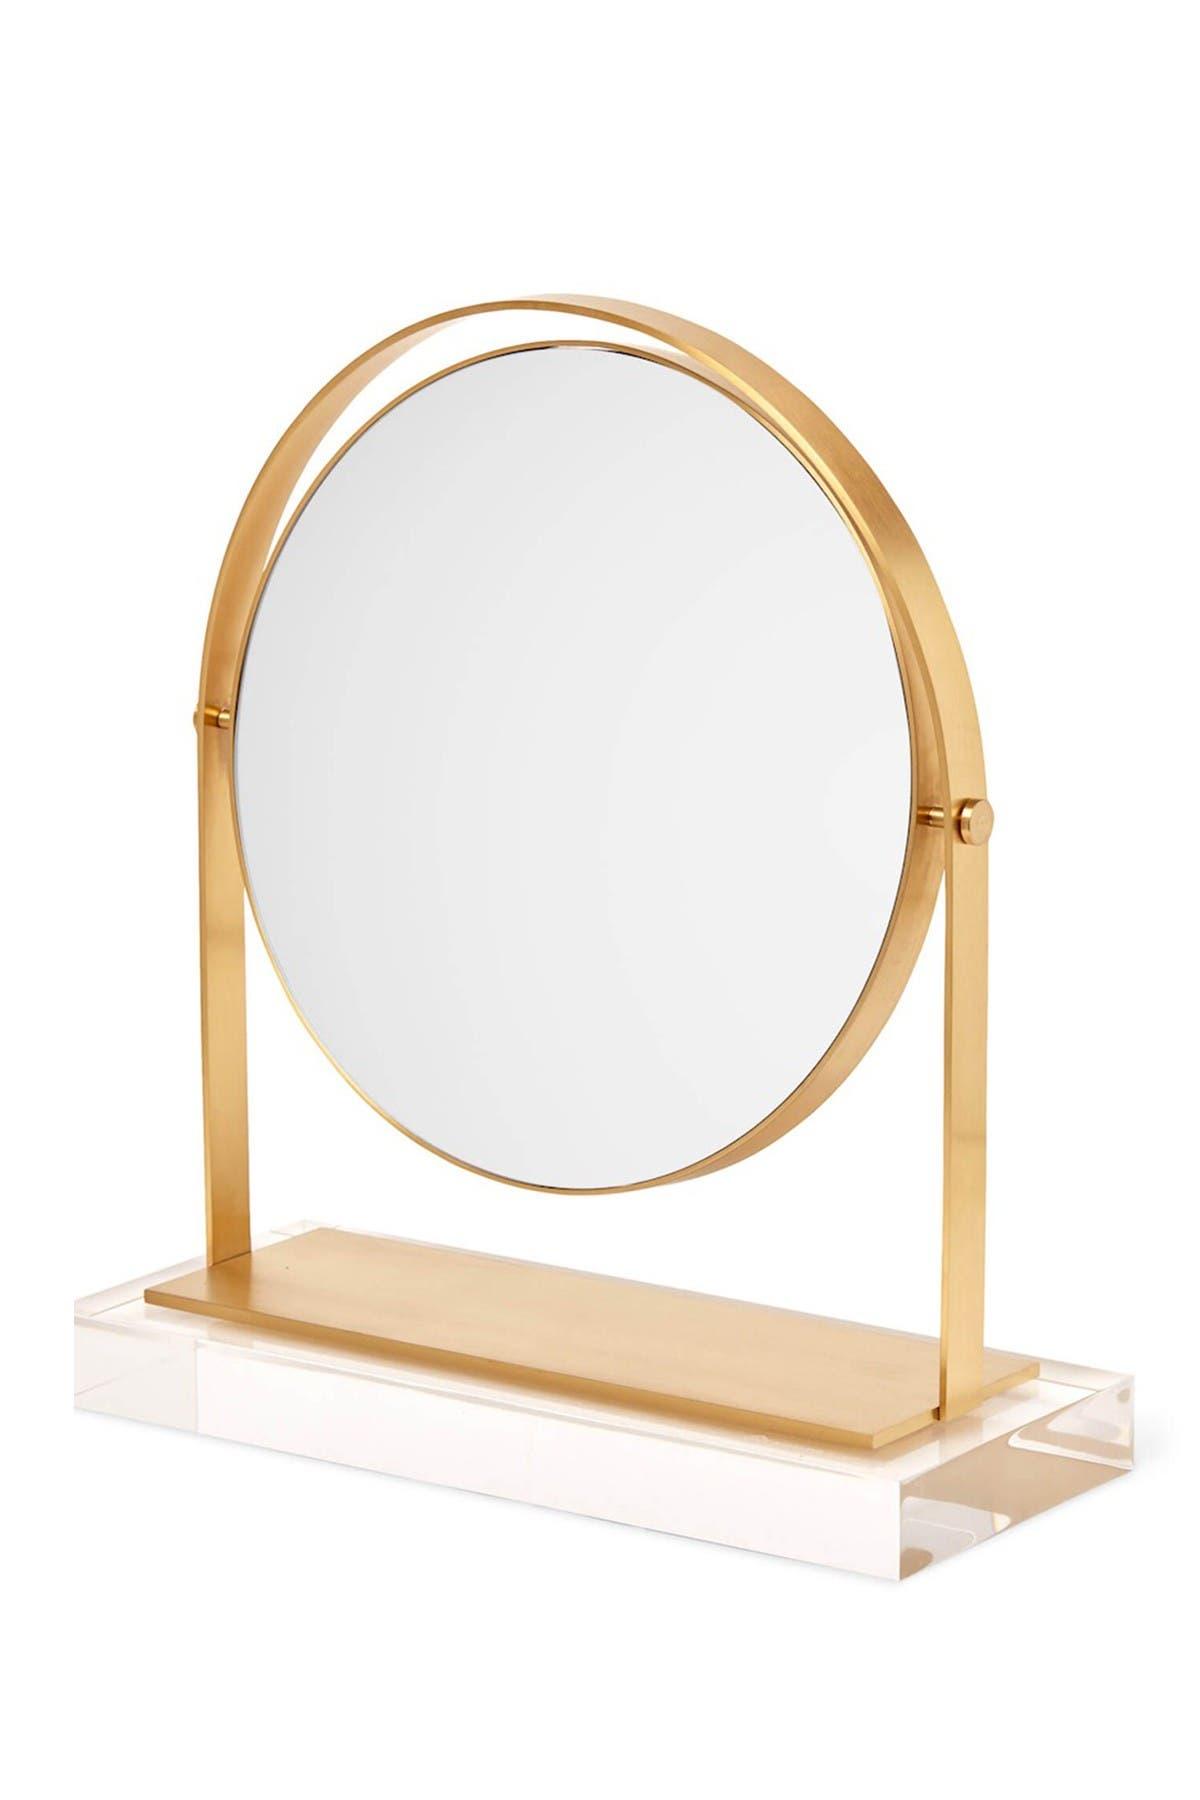 Kendra Scott Brass Acrylic Vanity Mirror Hautelook